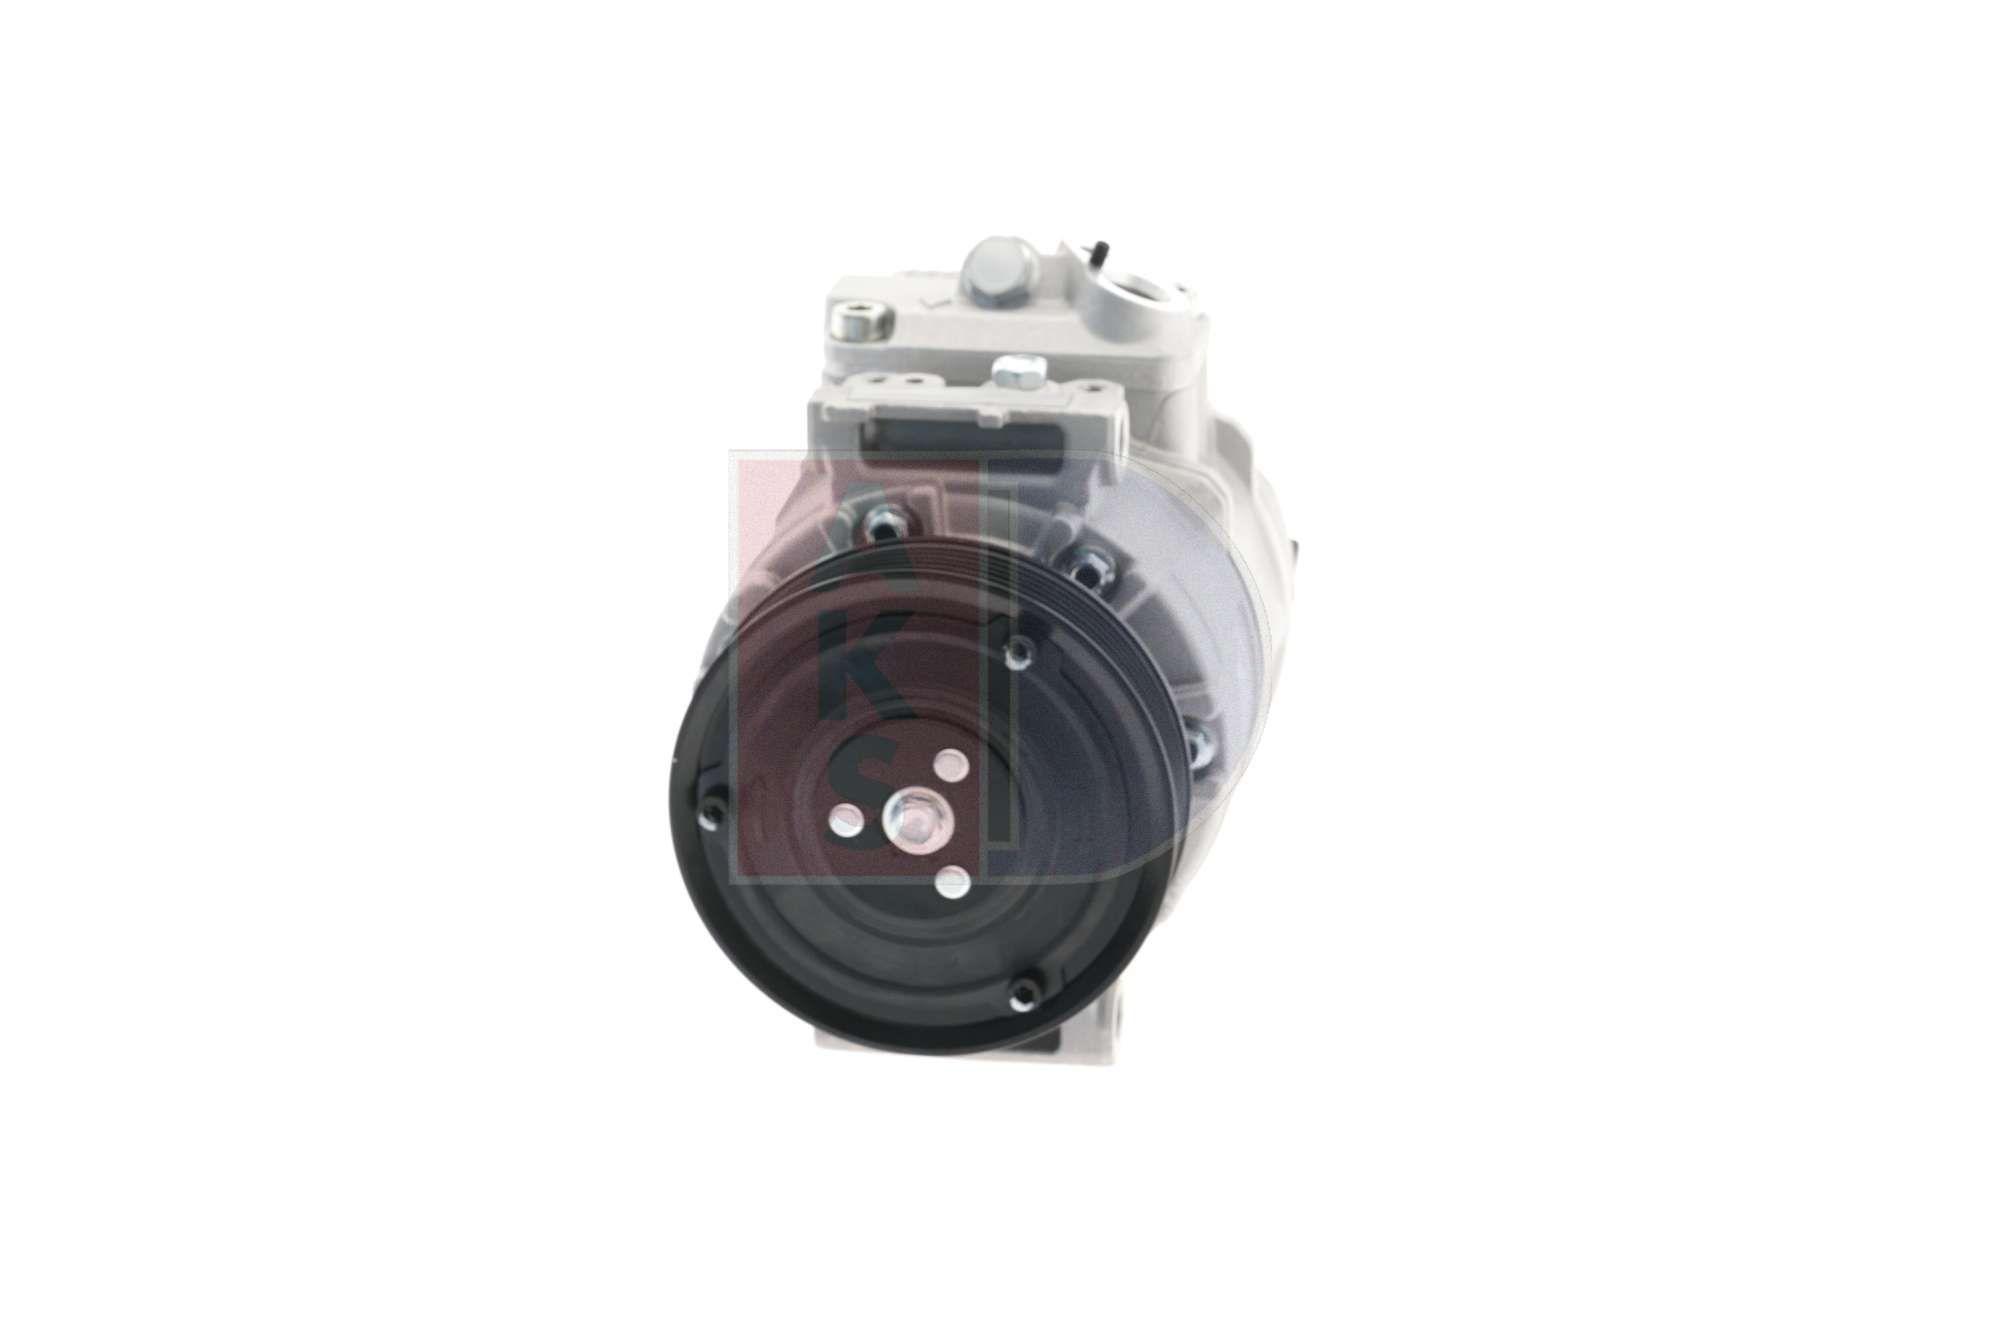 850682N Kältemittelkompressor AKS DASIS Erfahrung